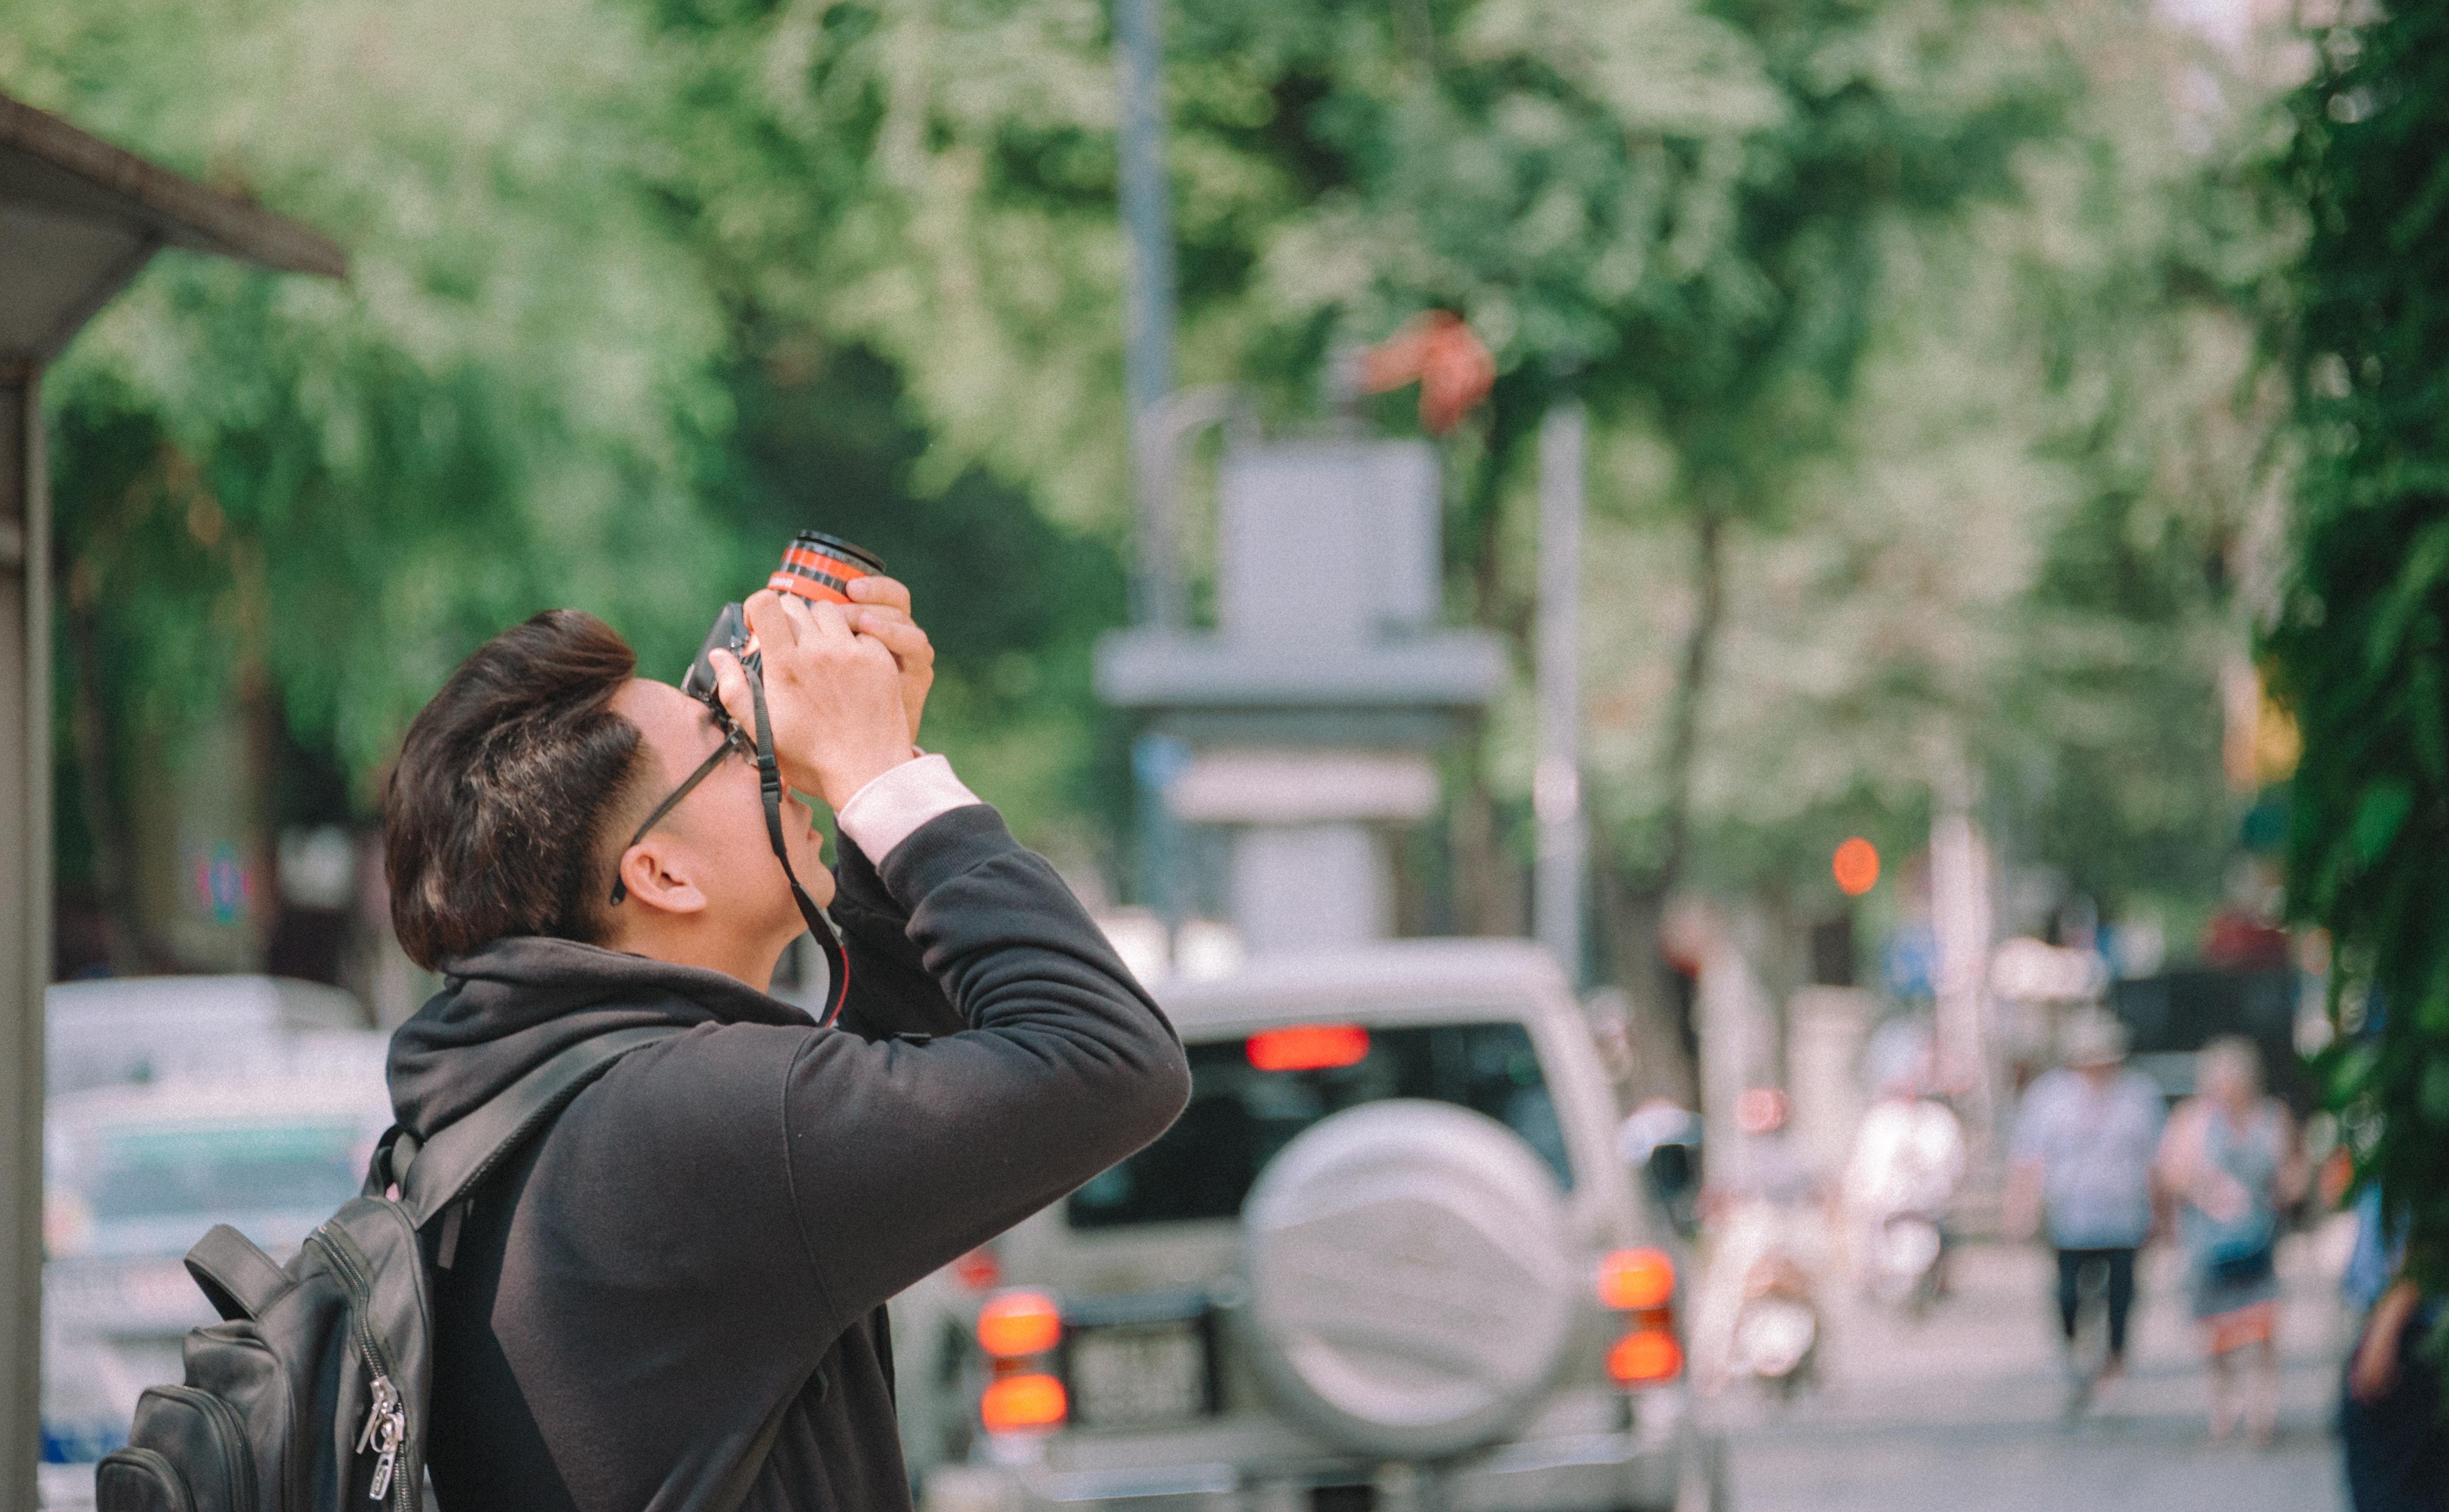 Man wearing black hoodie holding dslr camera shooting on upper direction photo